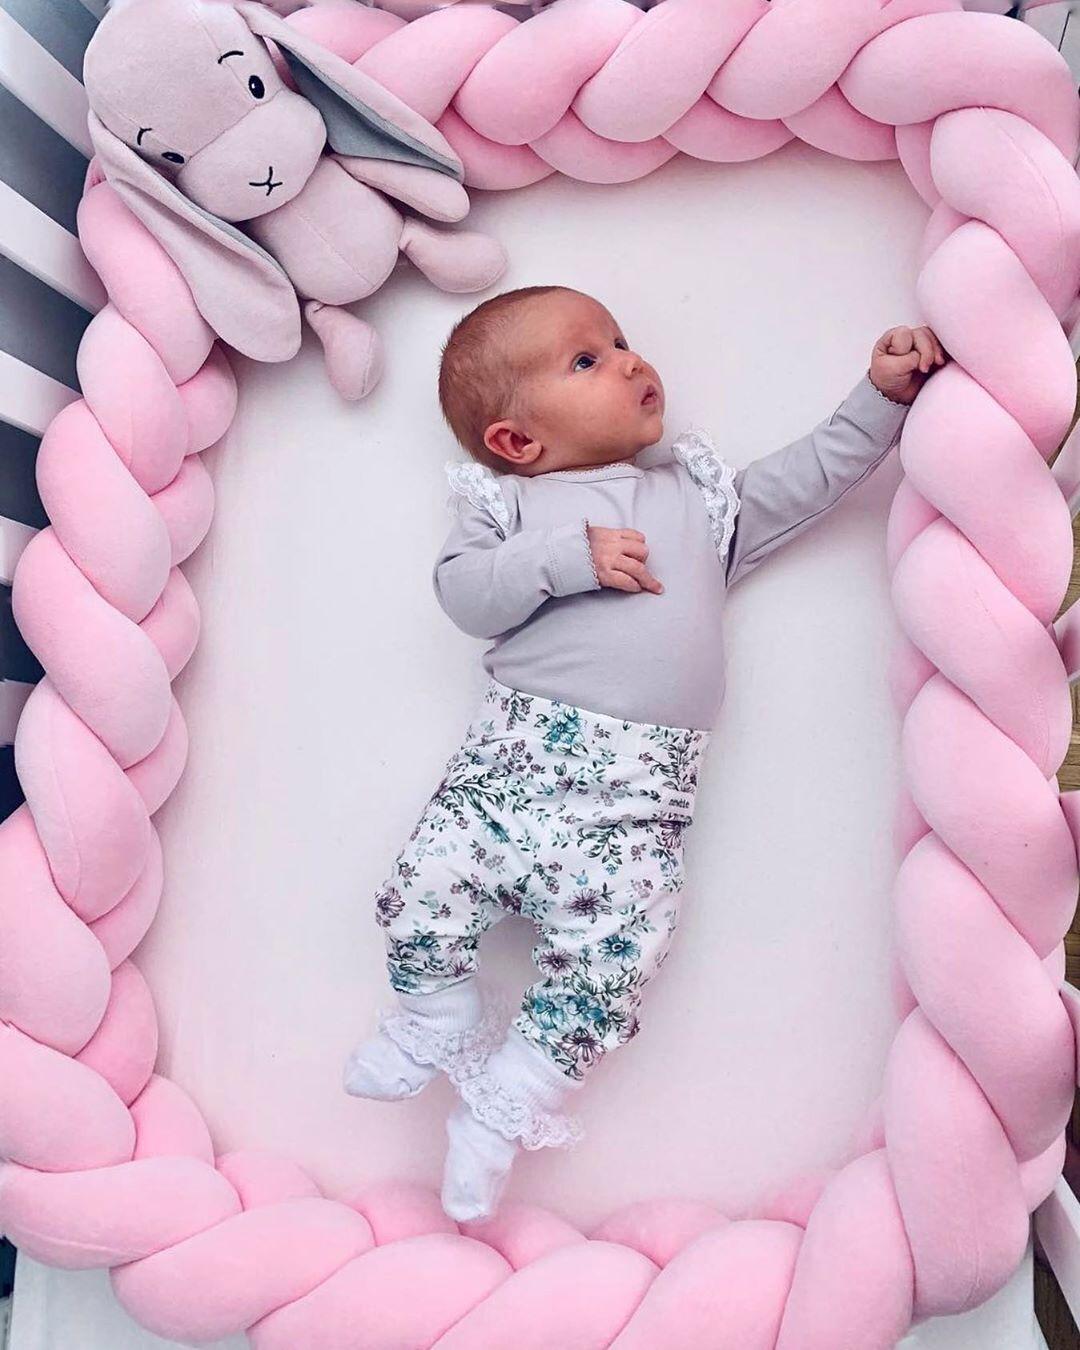 Newborn Trenza Cuna Baby Bed Bumper Knot/Protector Tour De Lit Bebe Tresse Baby Bumper Cot Bumpers In Crib Warkocz Do Lozeczka